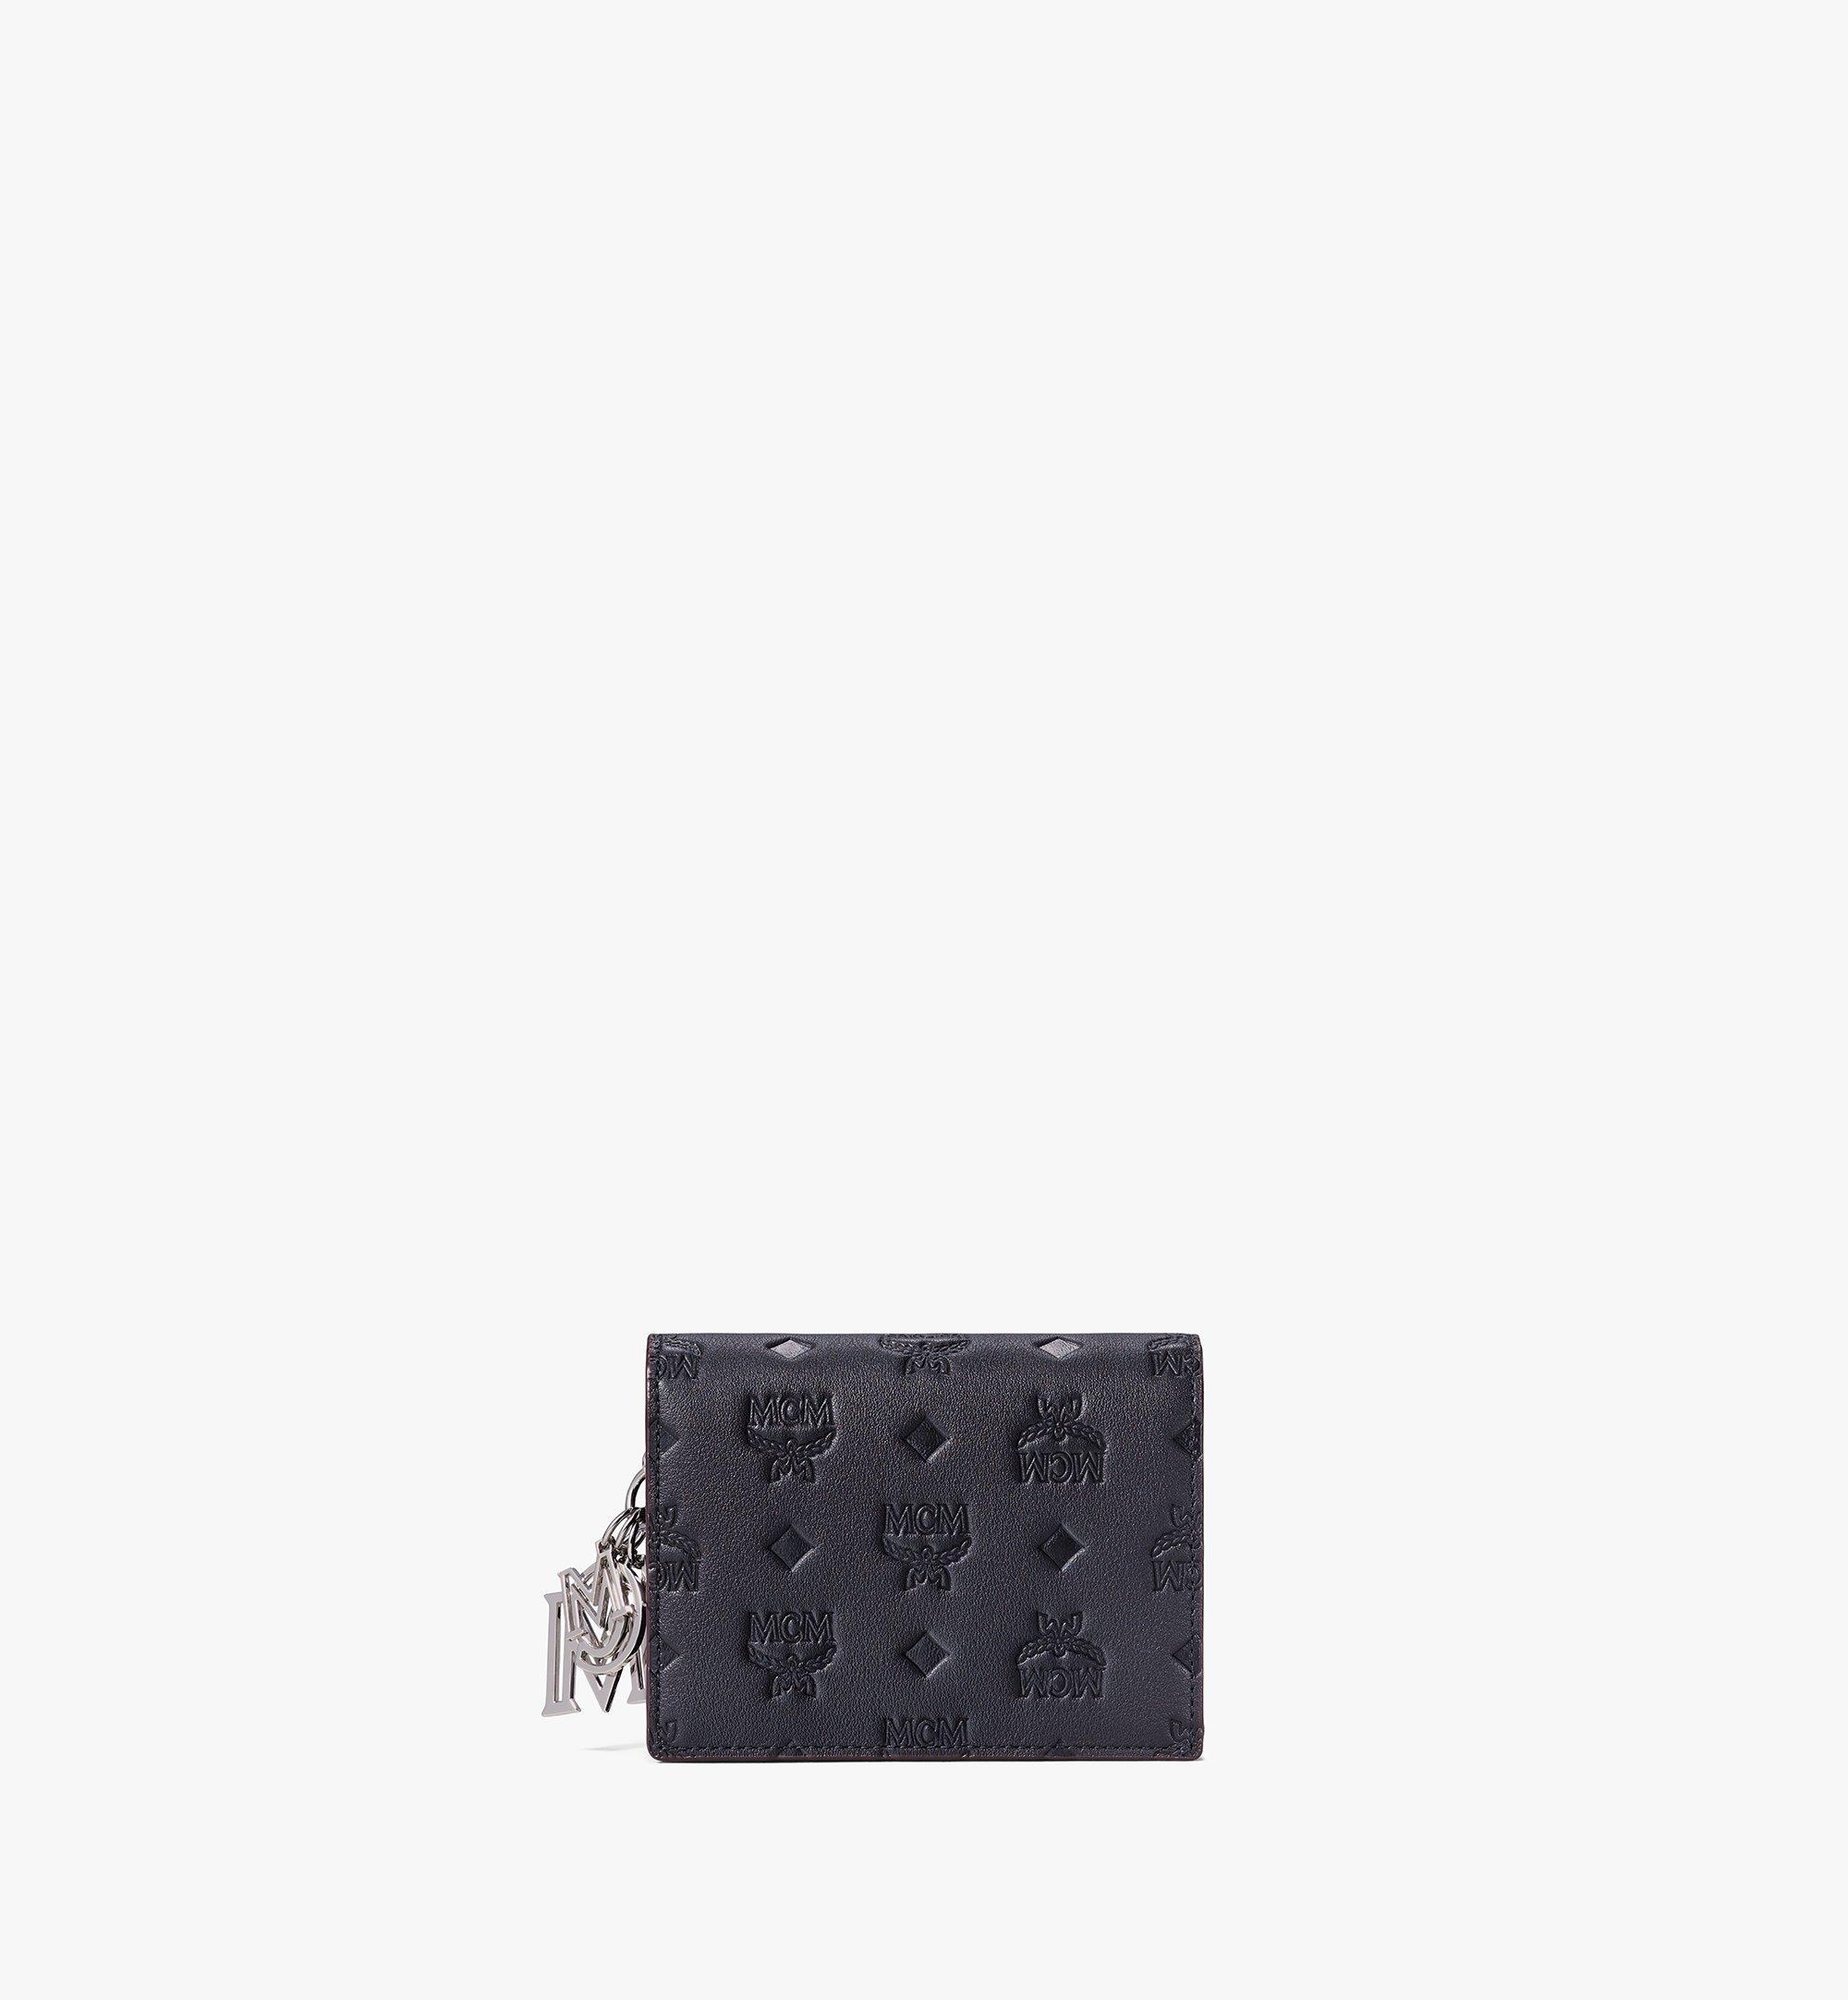 MCM Klara Chain Wallet in Monogram Leather Black MYLAAKM02BK001 Alternate View 1